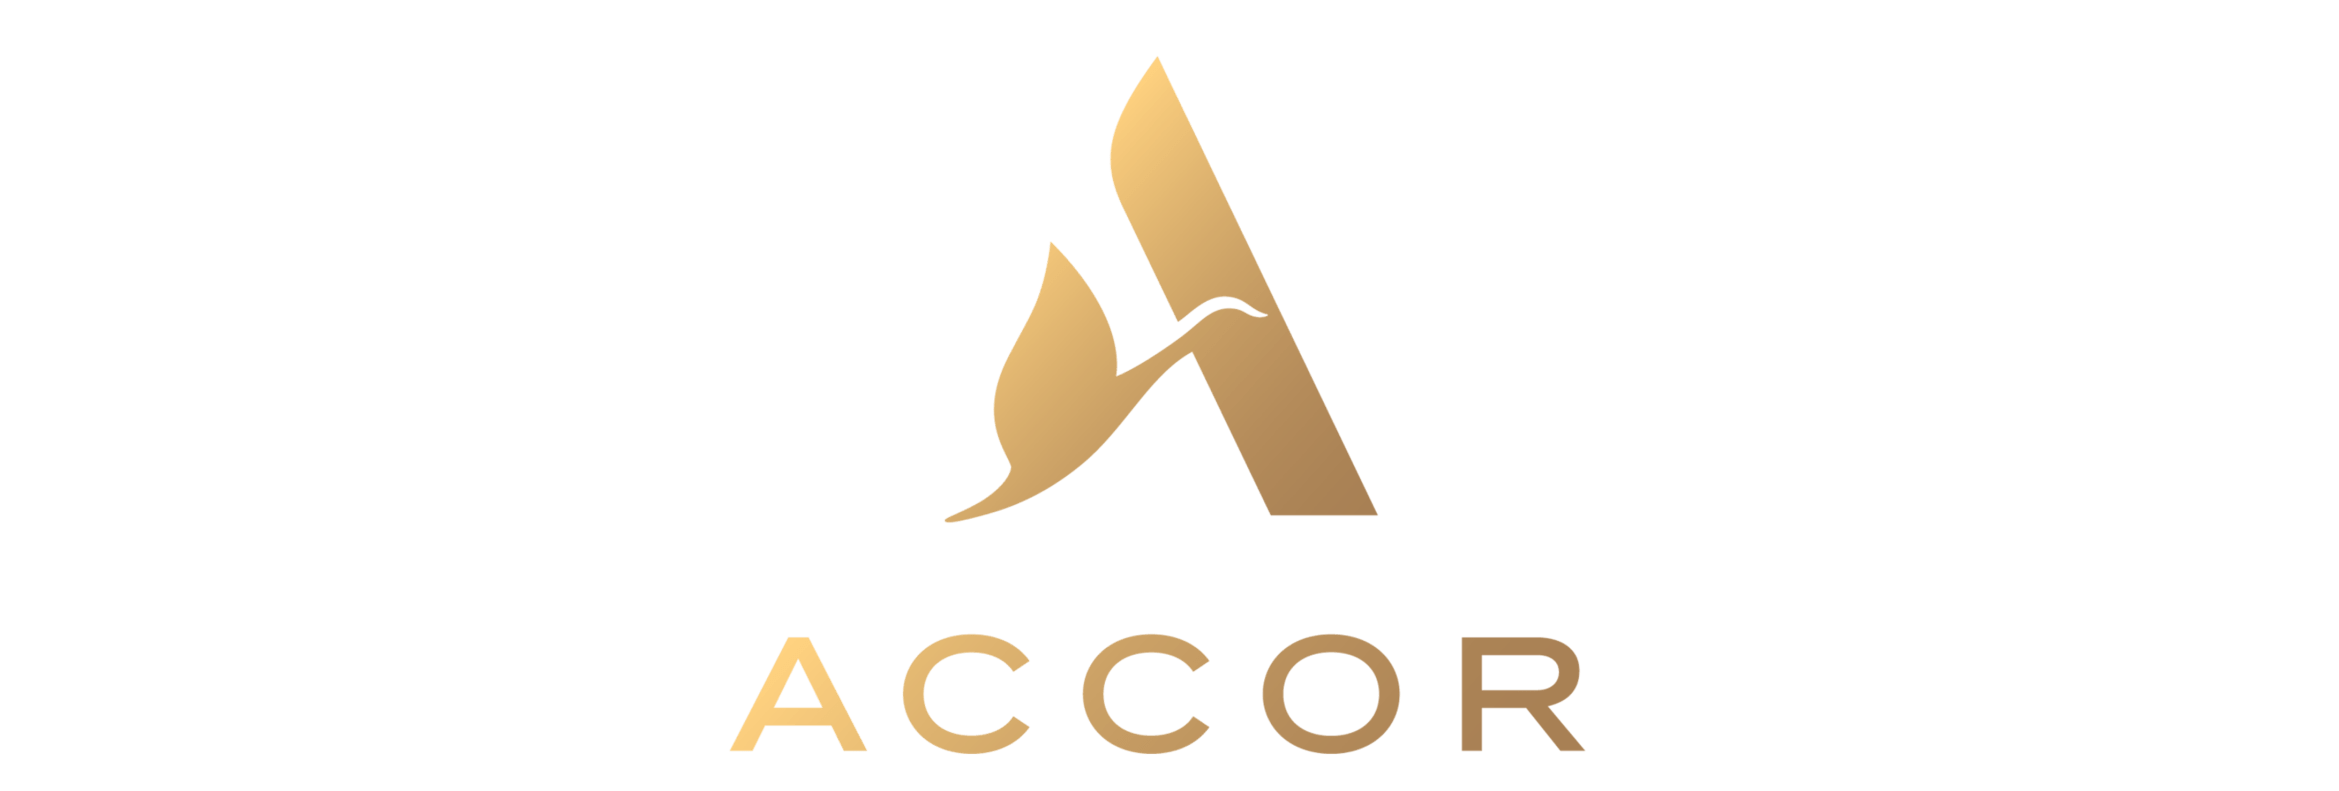 gekko-group-infinite-logo-accor